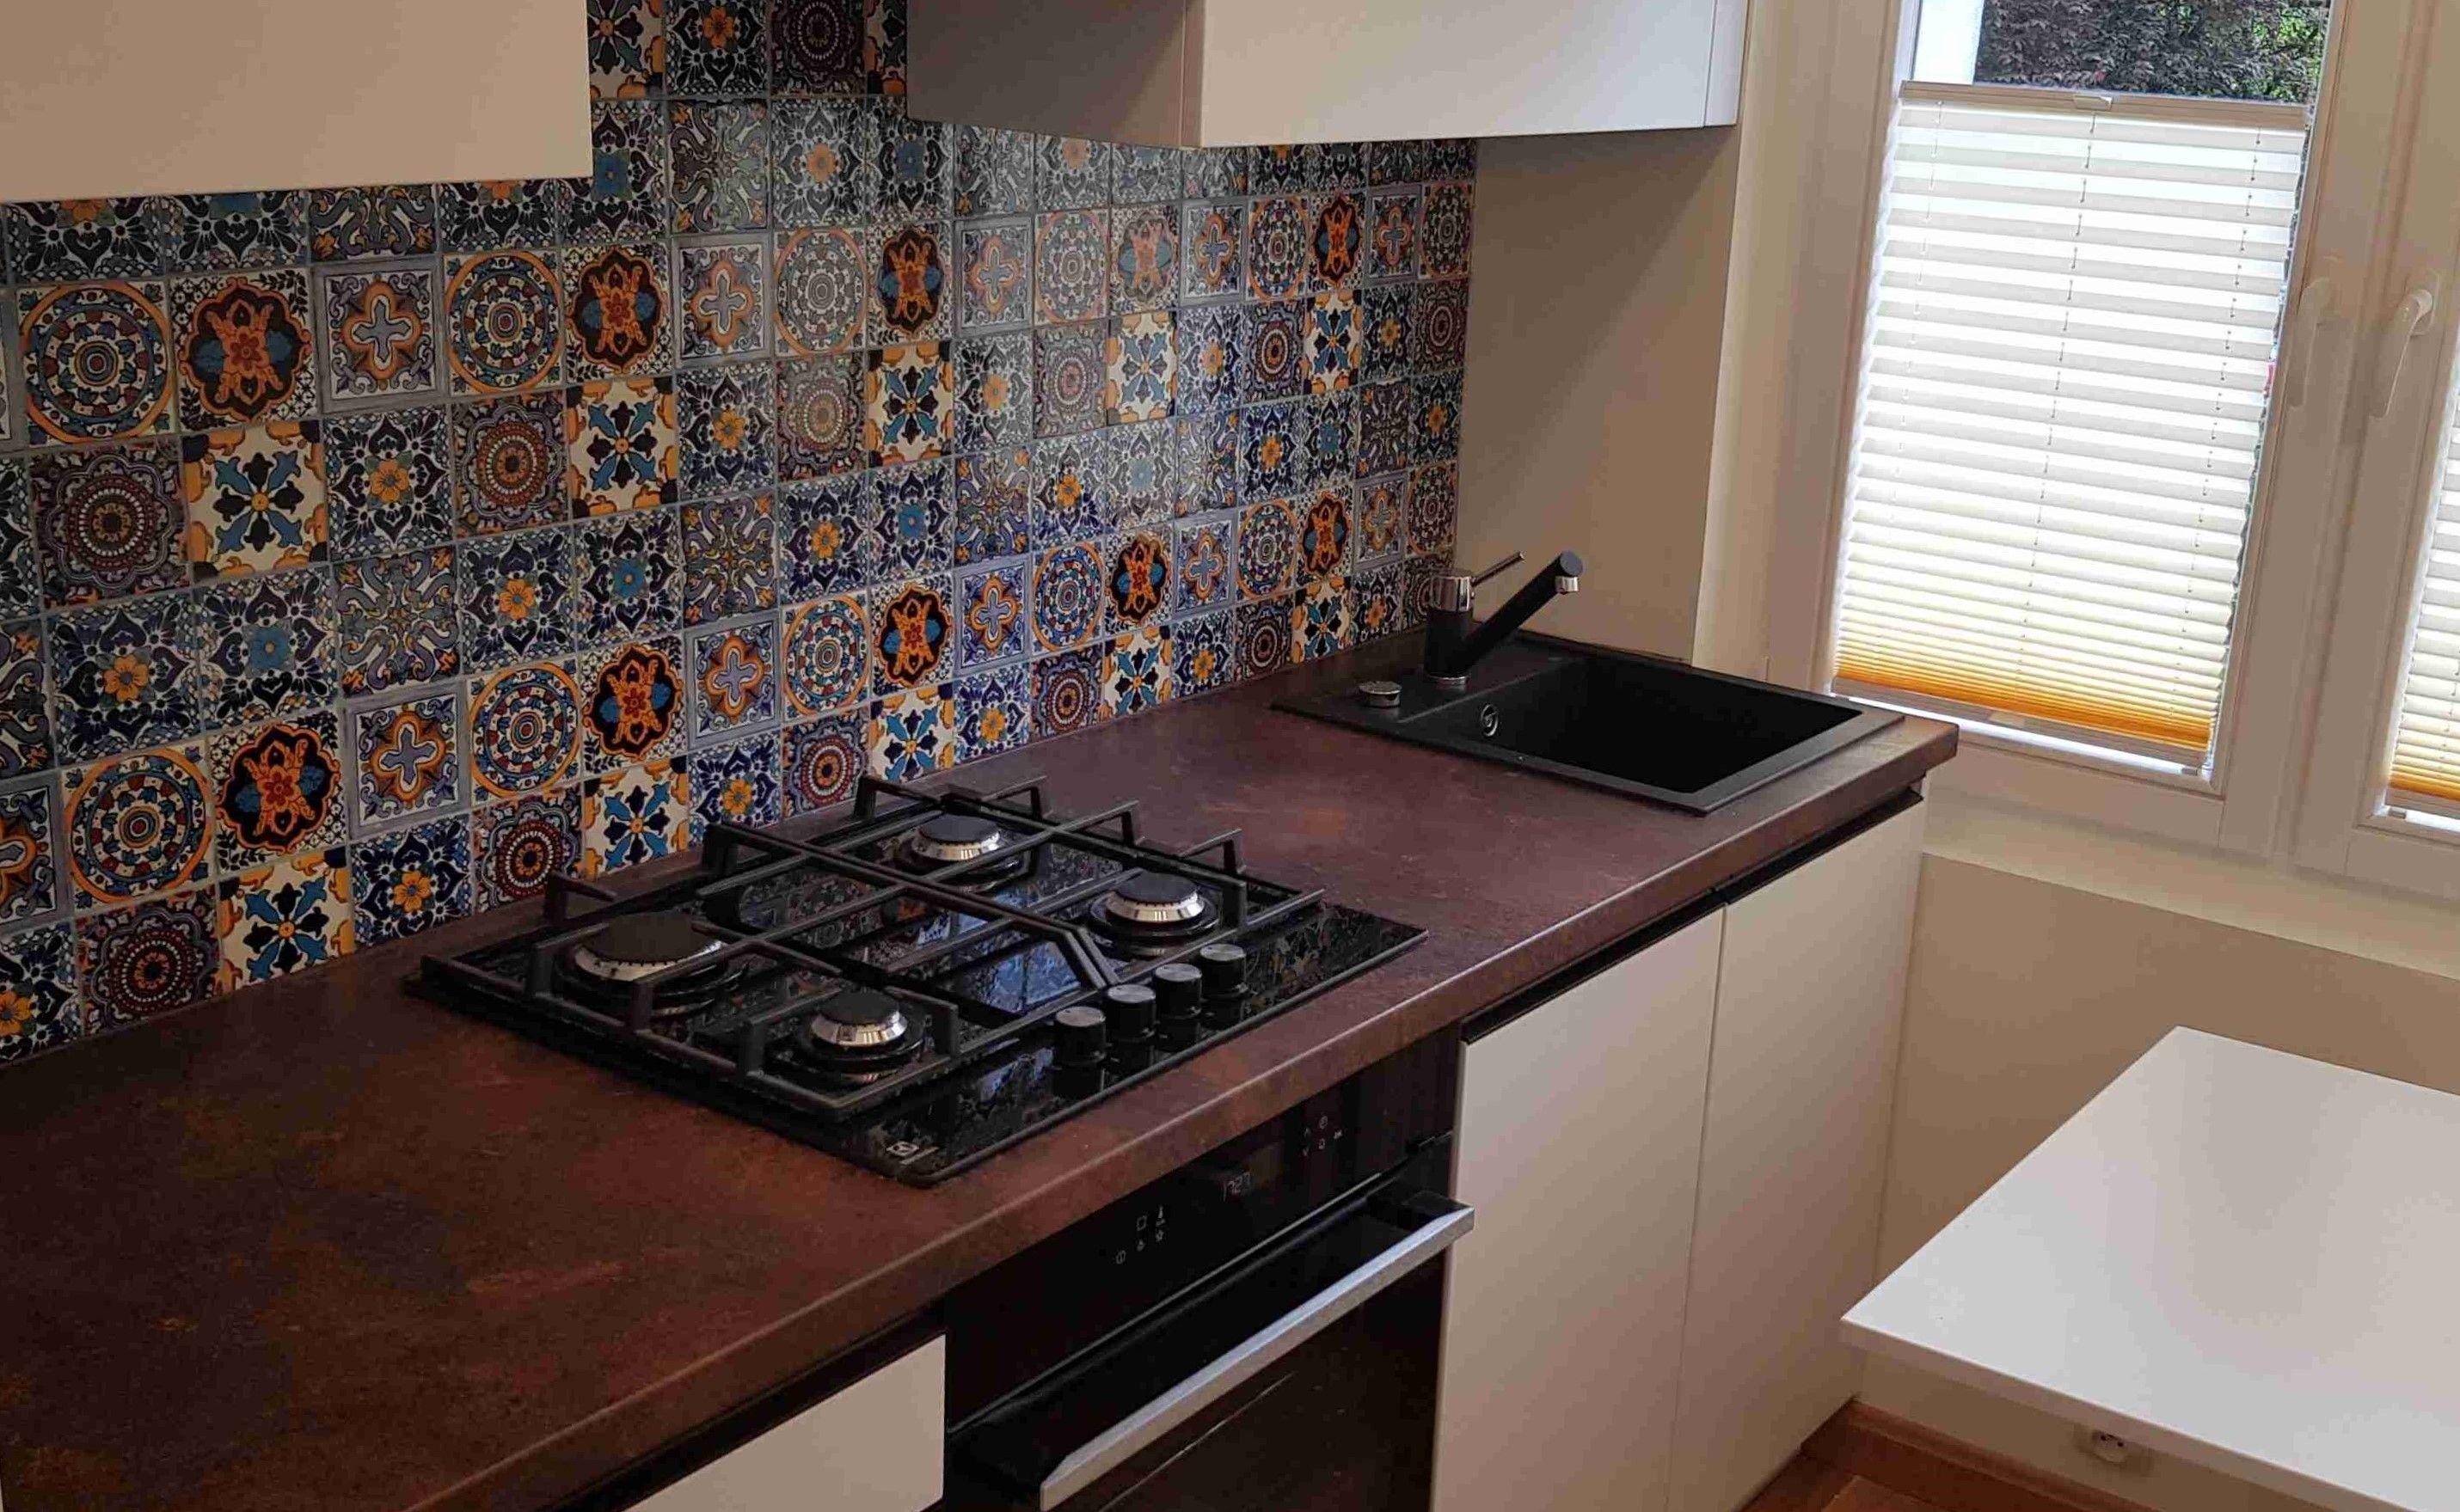 Plytki Meksykanskie Jednego Wzoru Nad Blatem W Kuchni Interiordesign Interiordesign Interiordesign Design Homedes Italia Design Kitchen Appliances Design